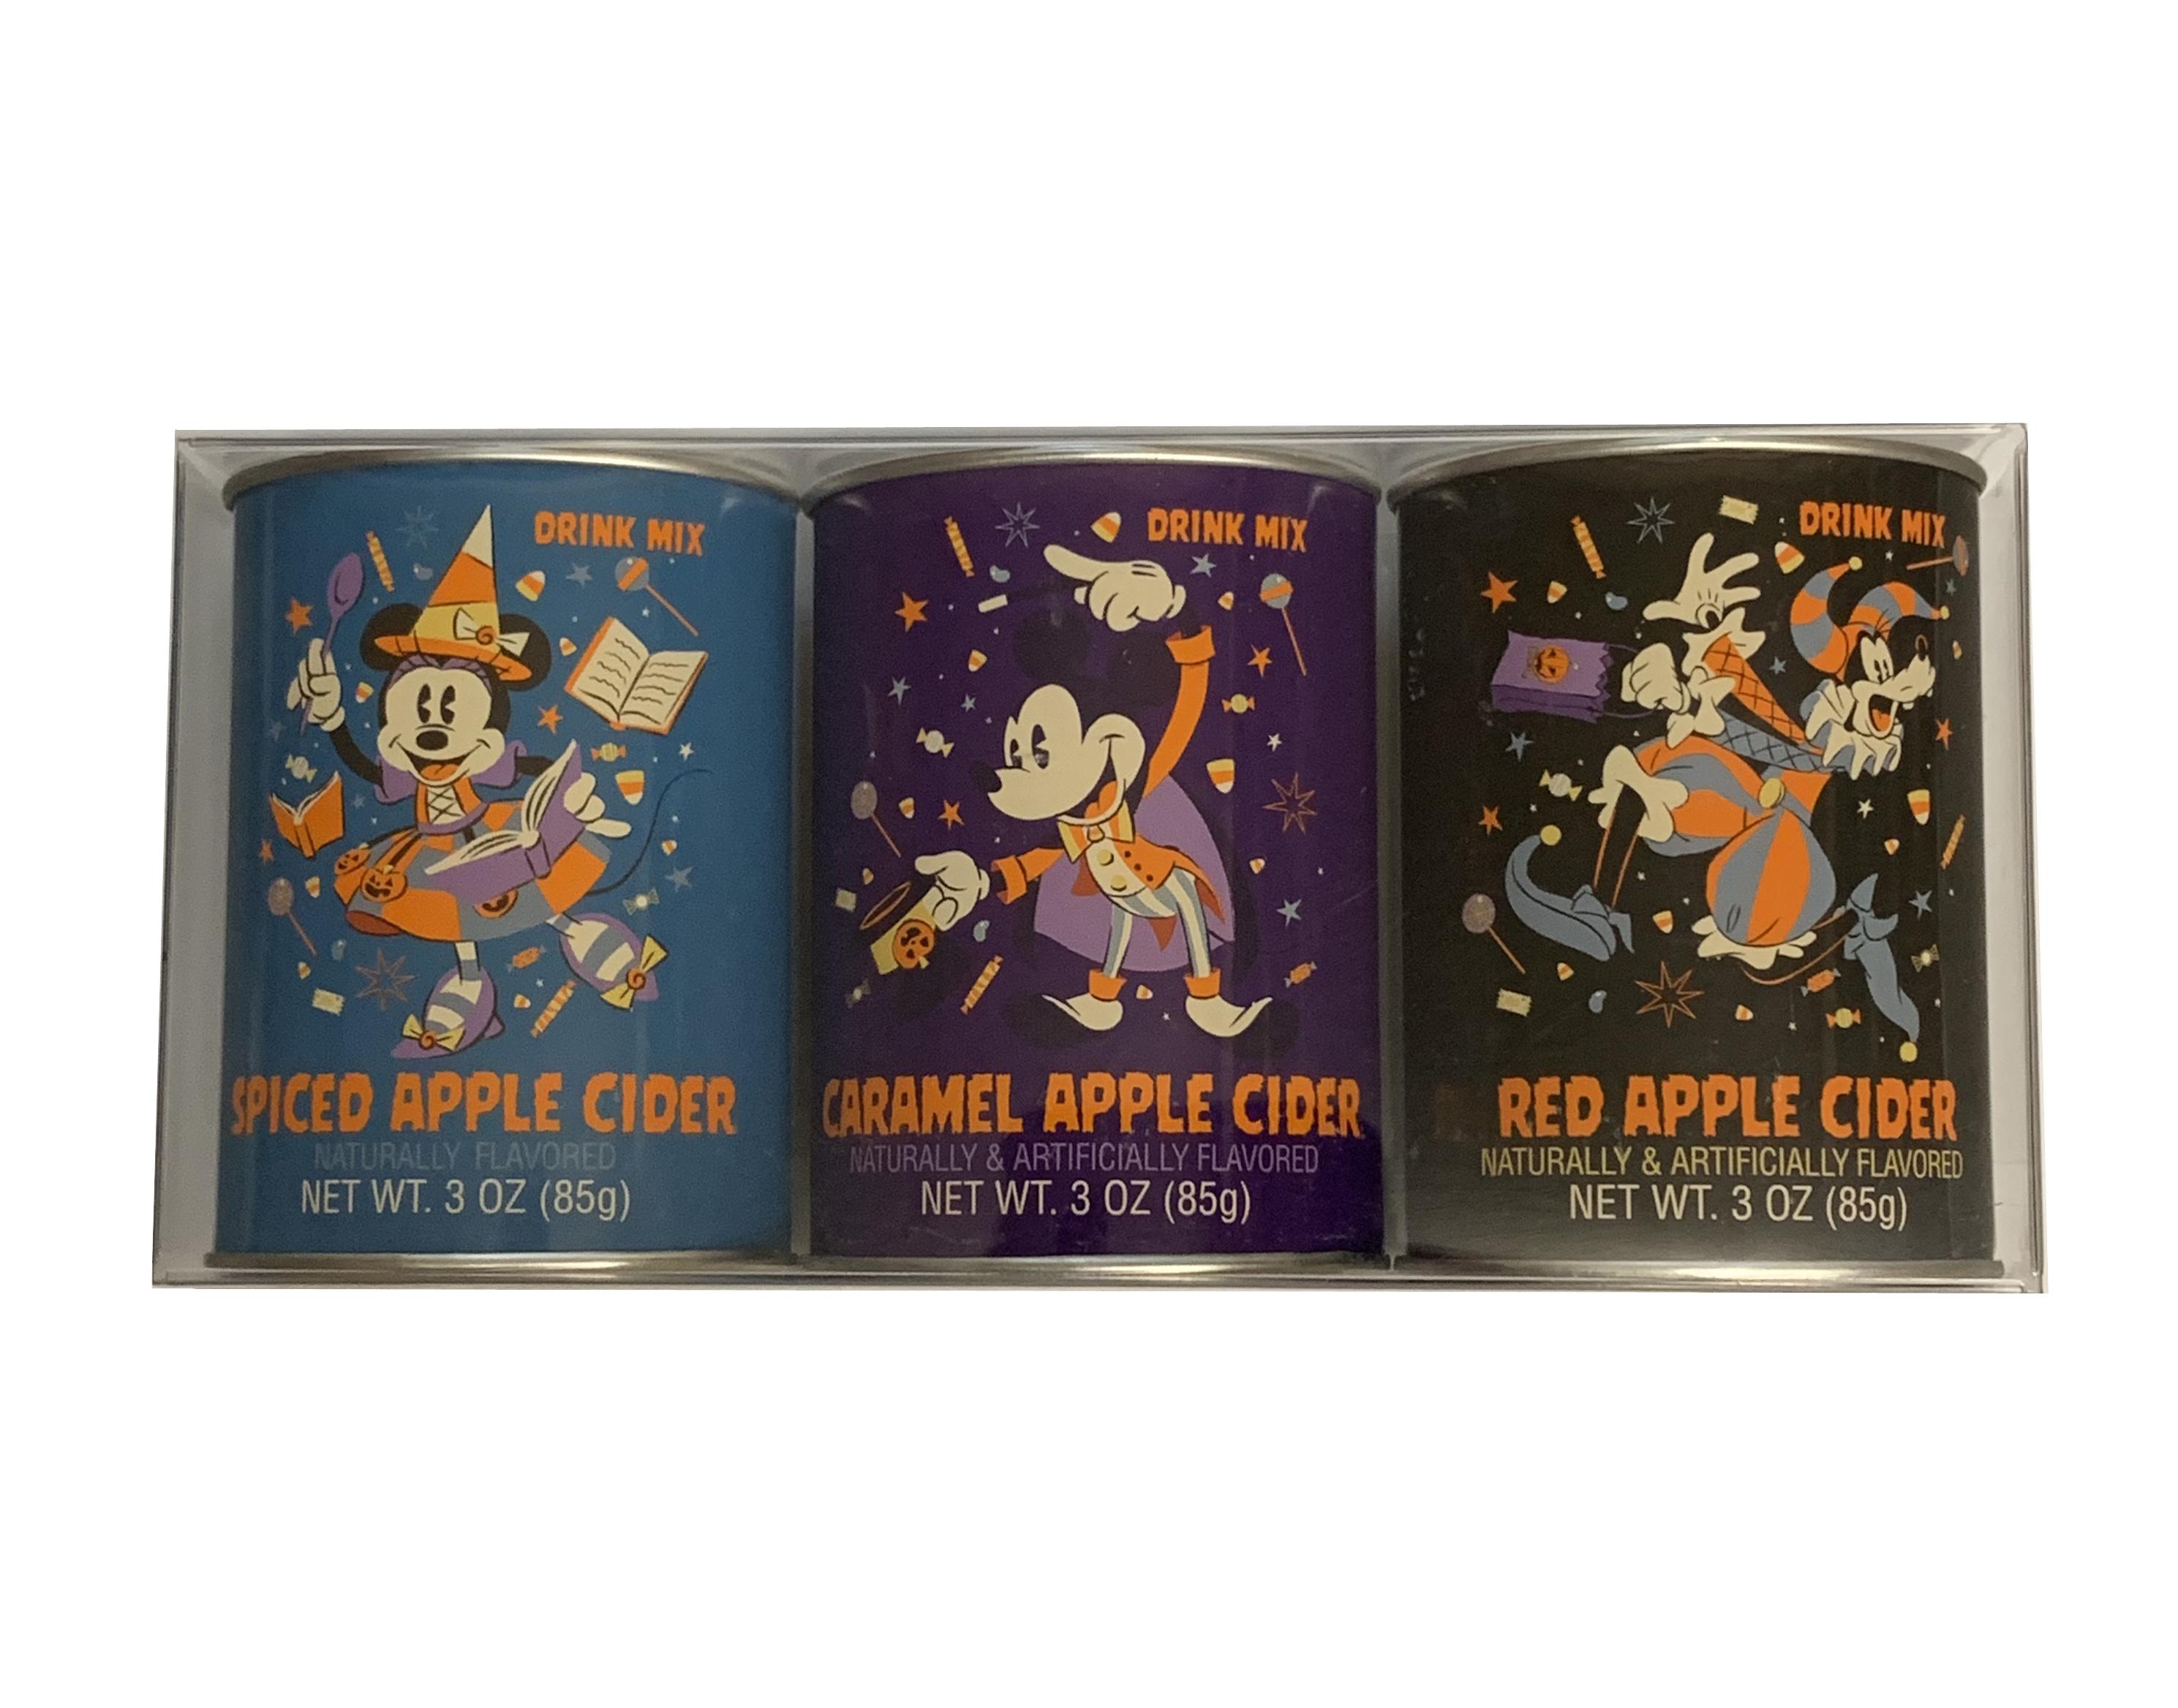 Halloween Mix 2020 Disney Drink Mix   2020 Halloween   Apple Cider   3 Pack